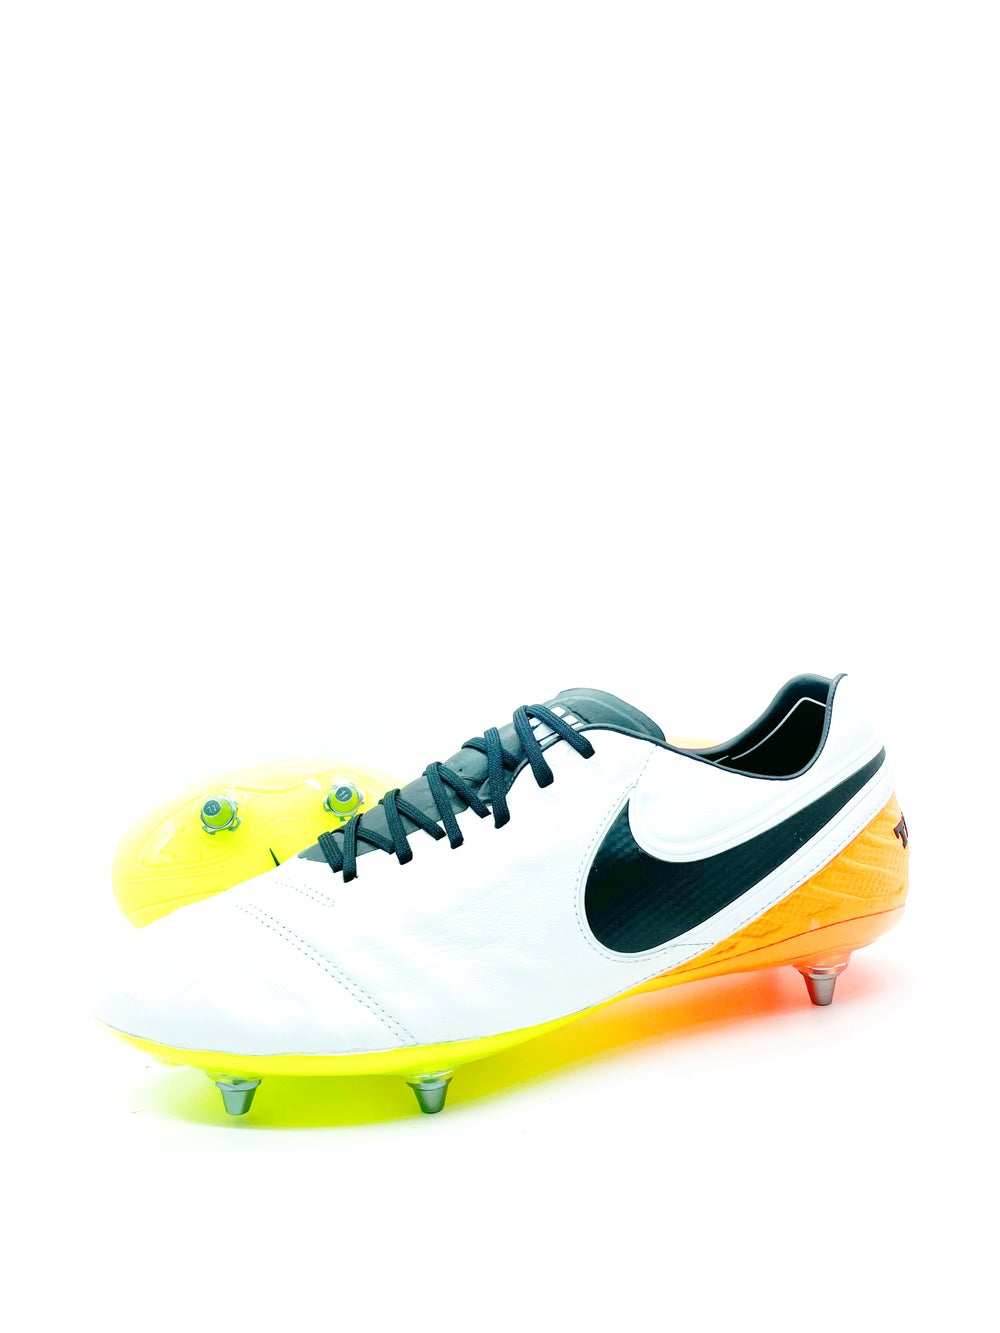 Image of Nike Tiempo VII Sg-pro